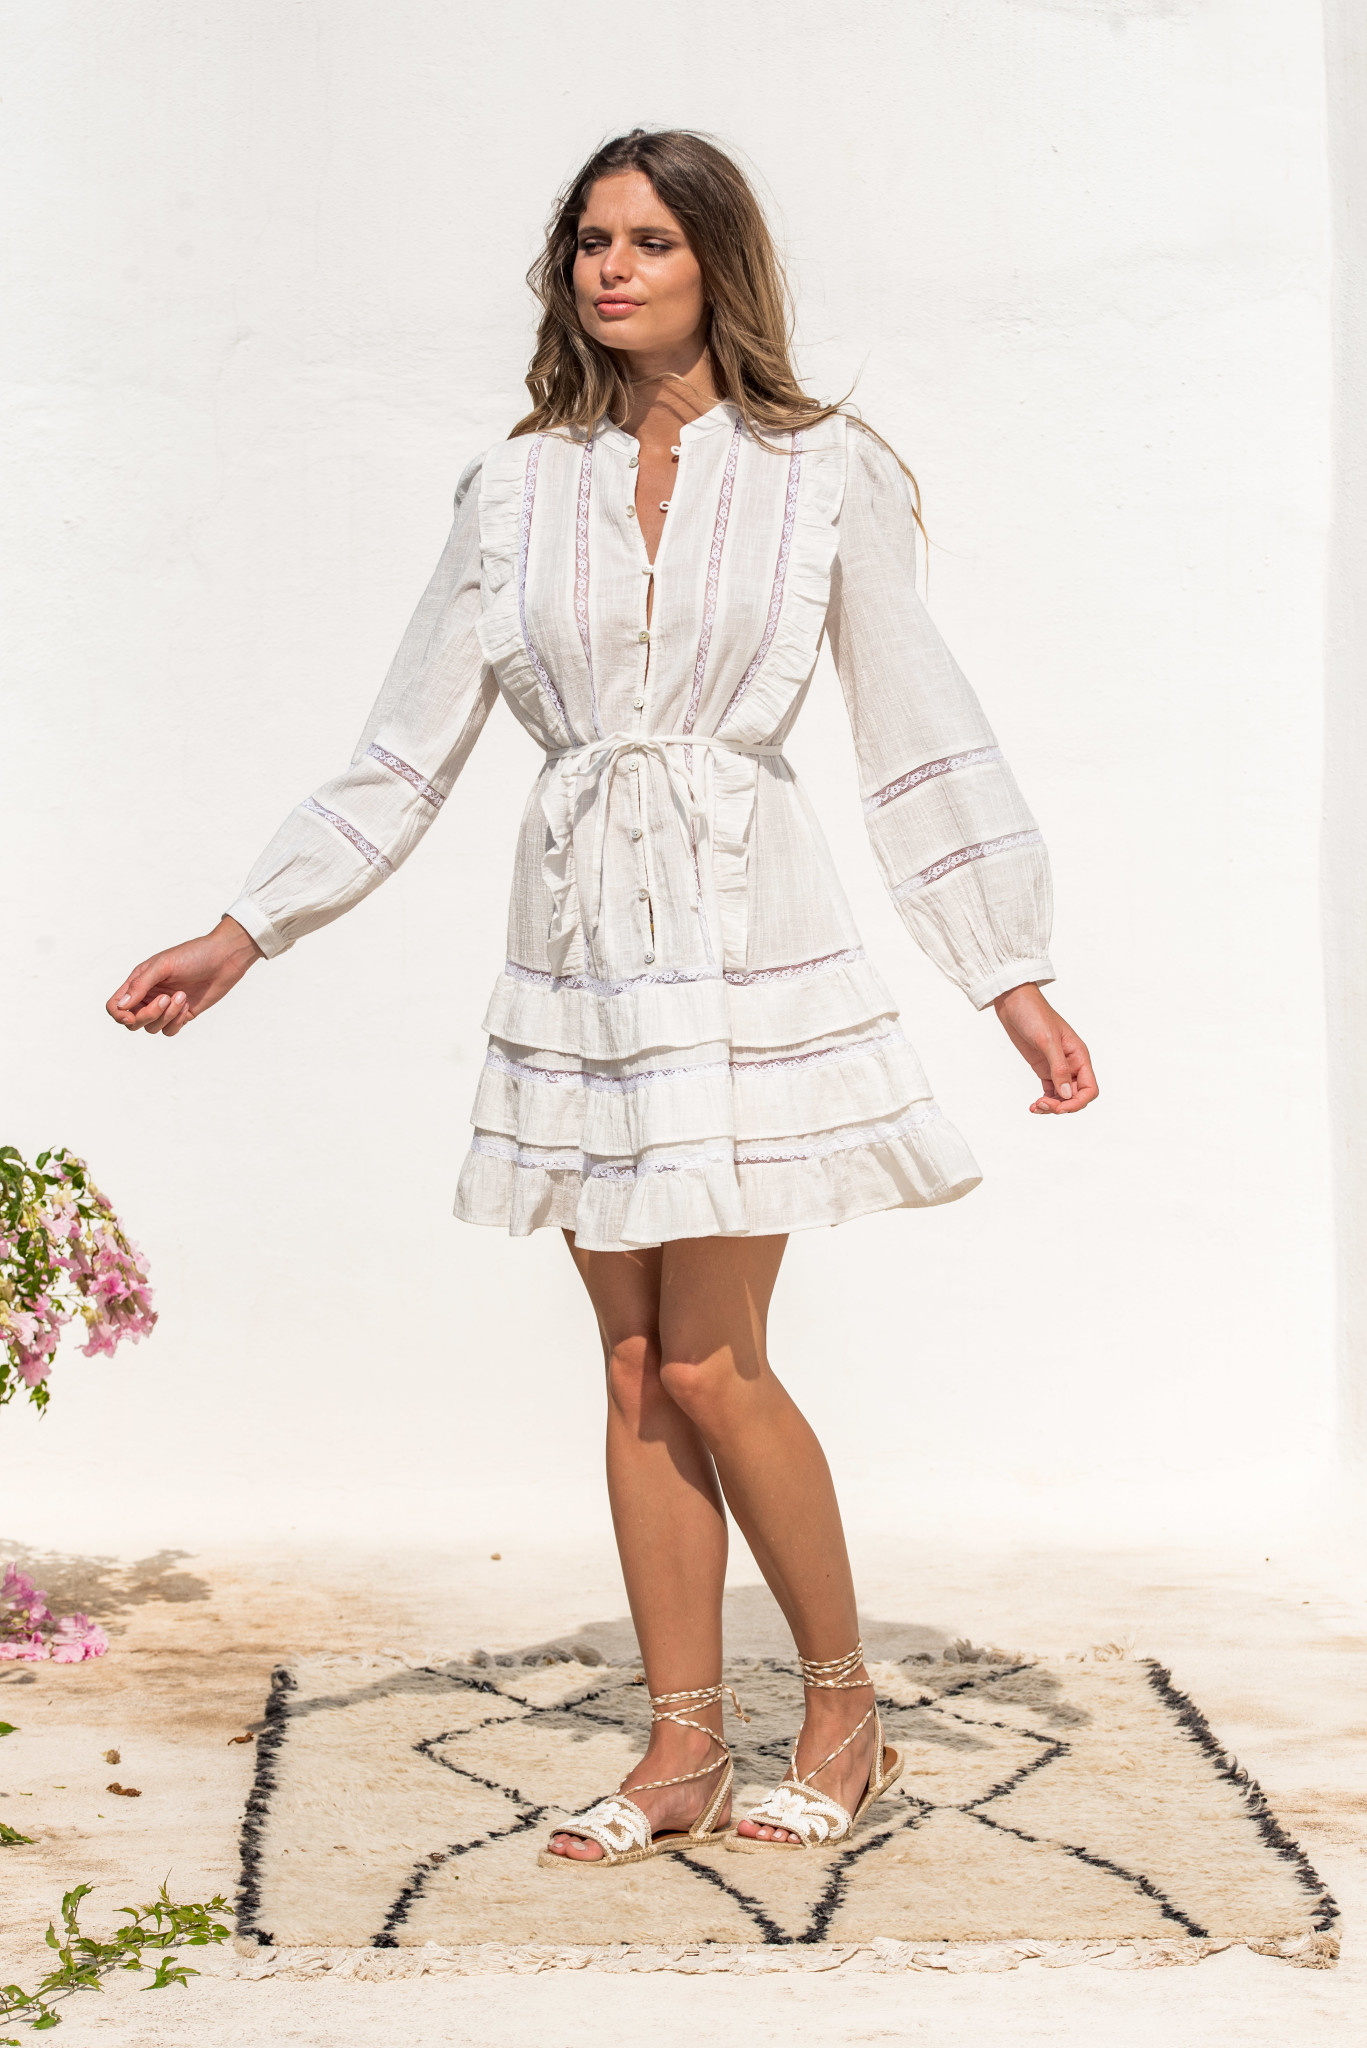 Piti Cuiti S/S Dress Vestido Paris Piti Cuita